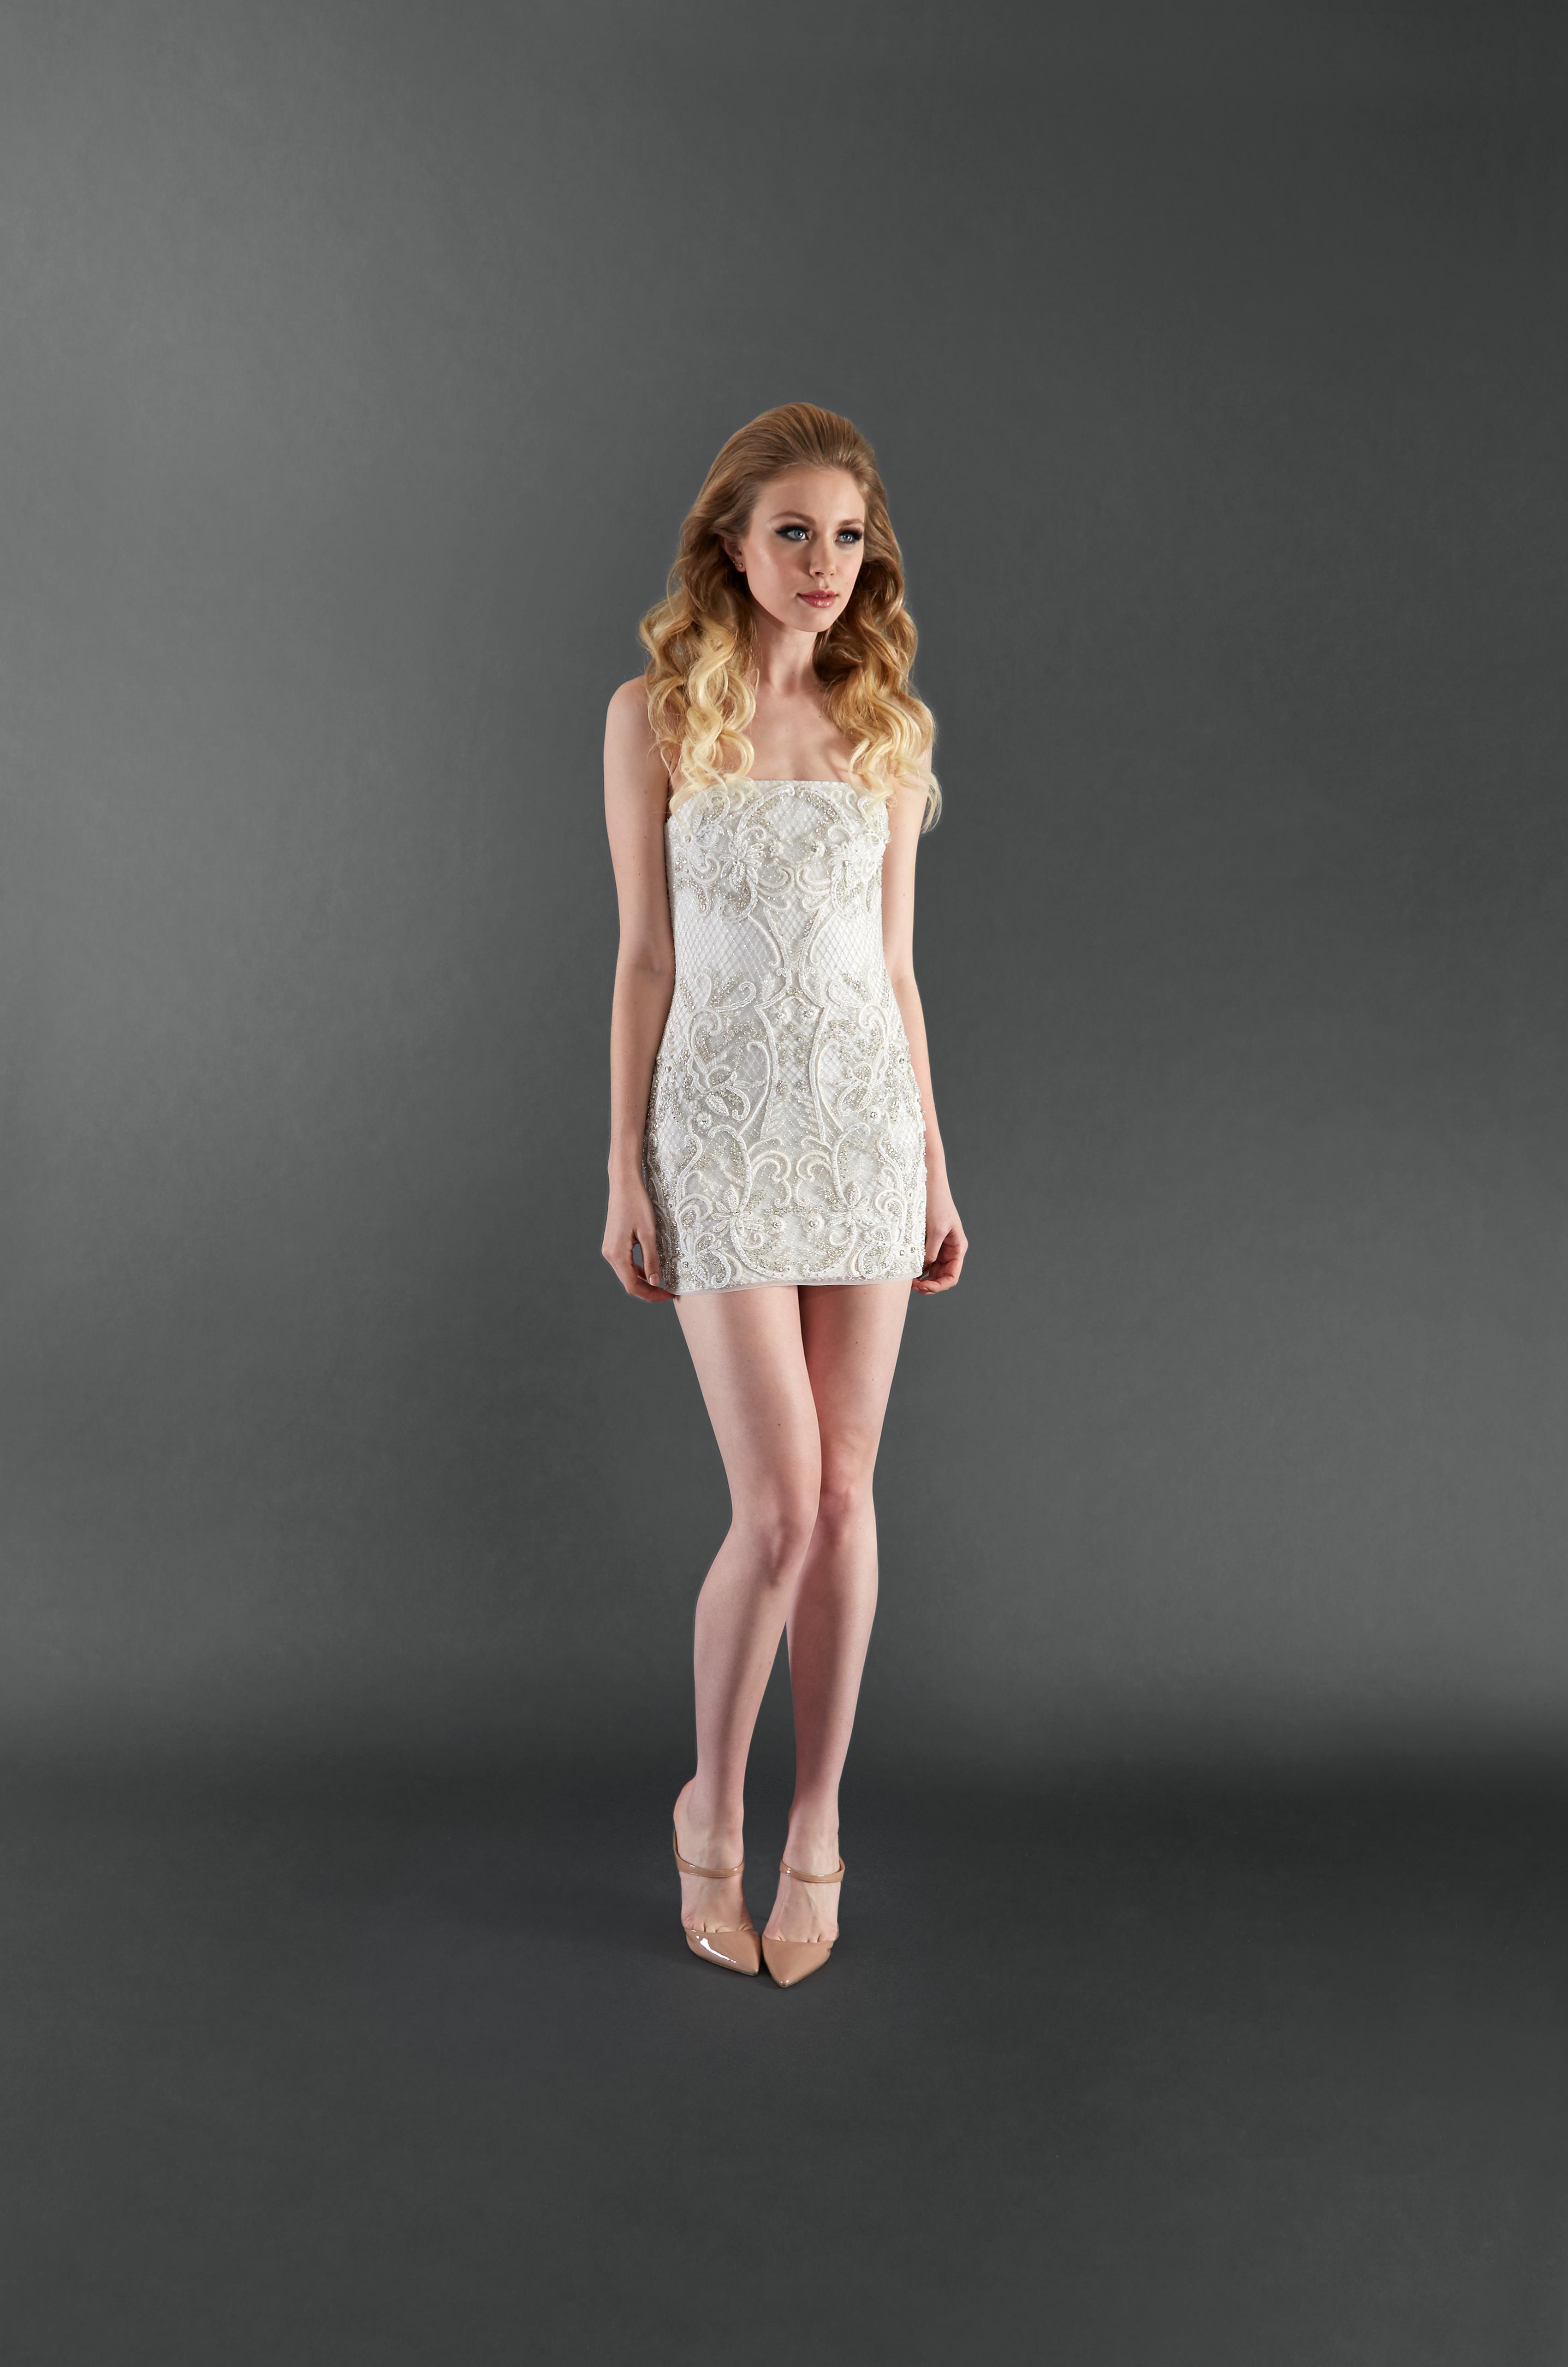 randi rahm short wedding dress spring 2018